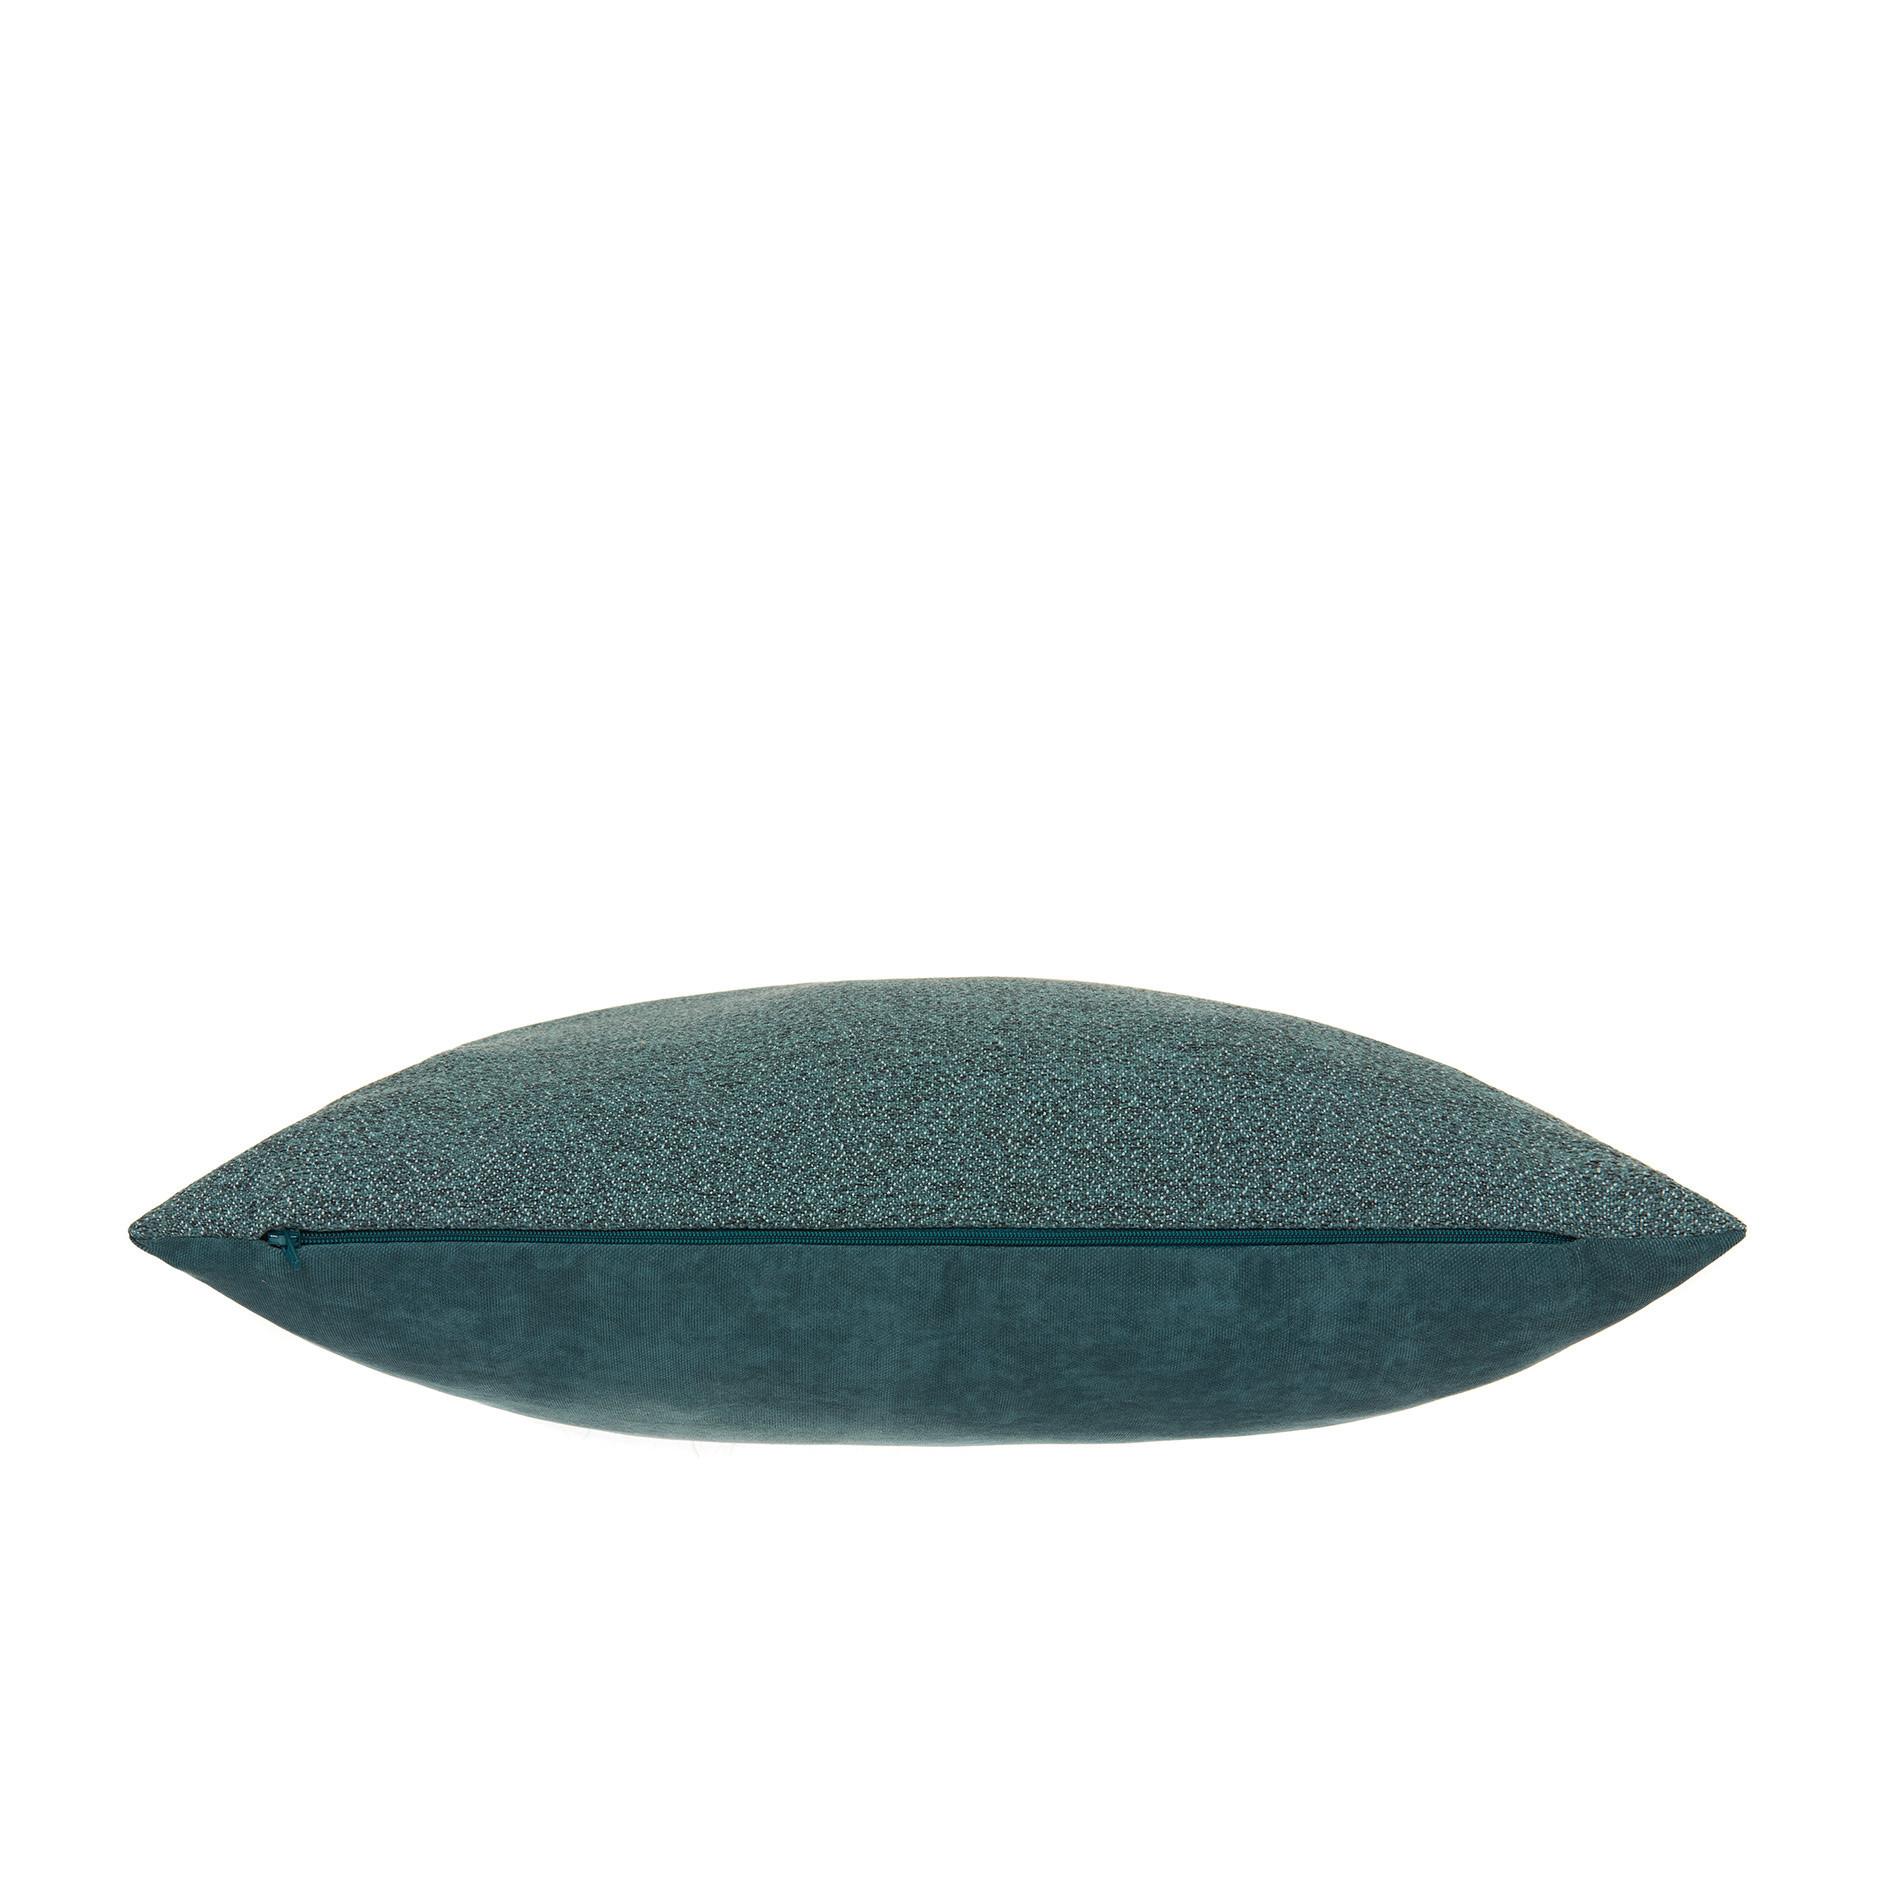 Cuscino sfumature melange 50x50cm, Verde scuro, large image number 2